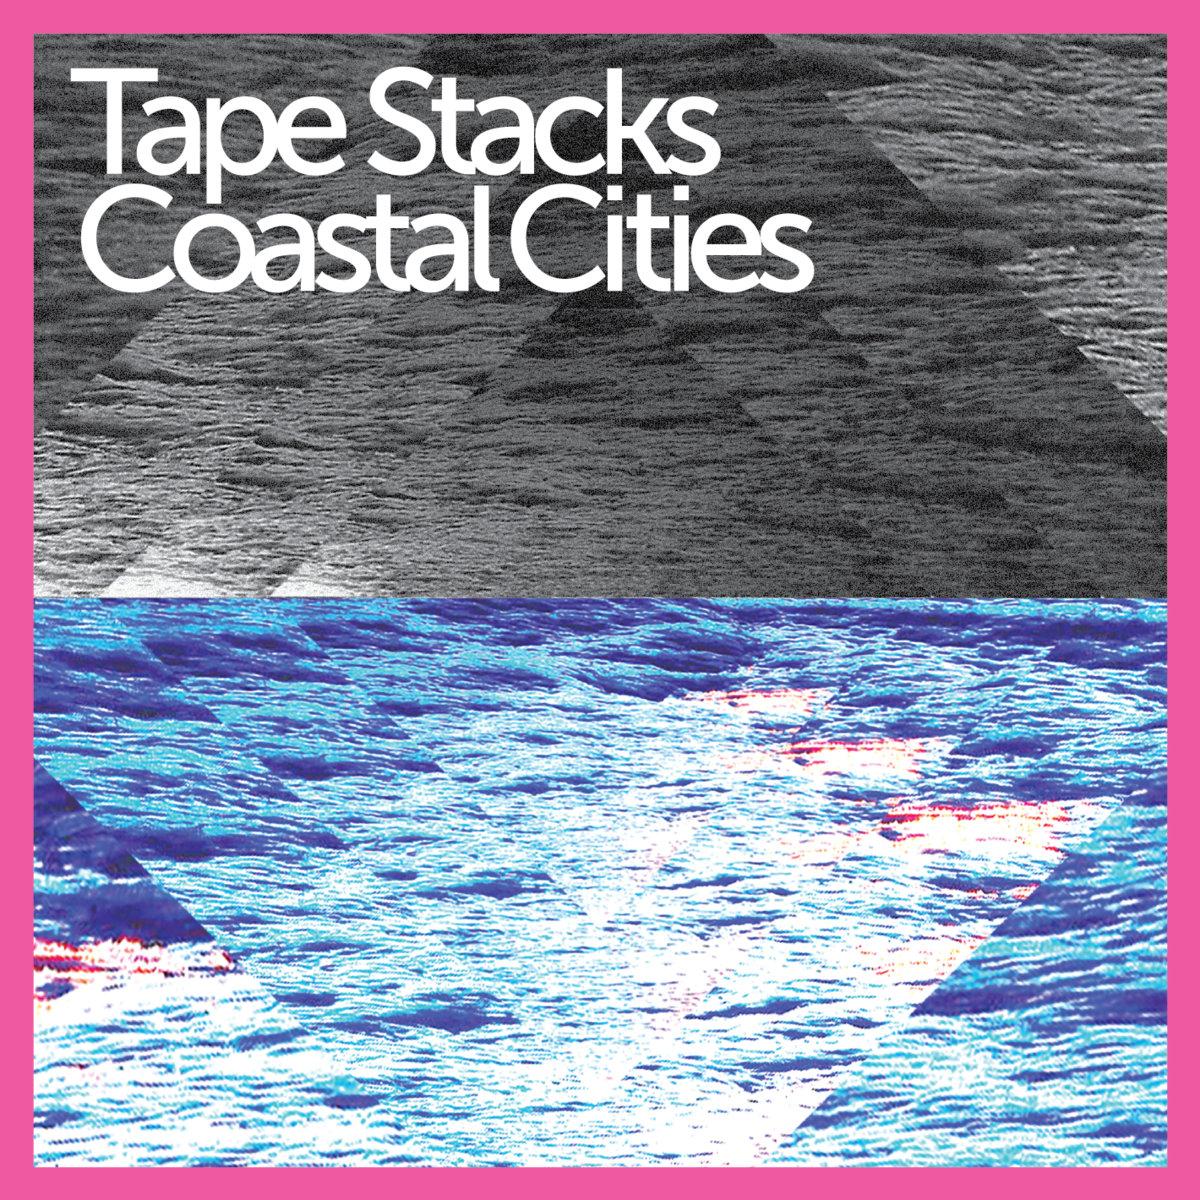 TAPE STACKS -COASTAL CITIES - PRODUCER / MIXER / ENGINEER